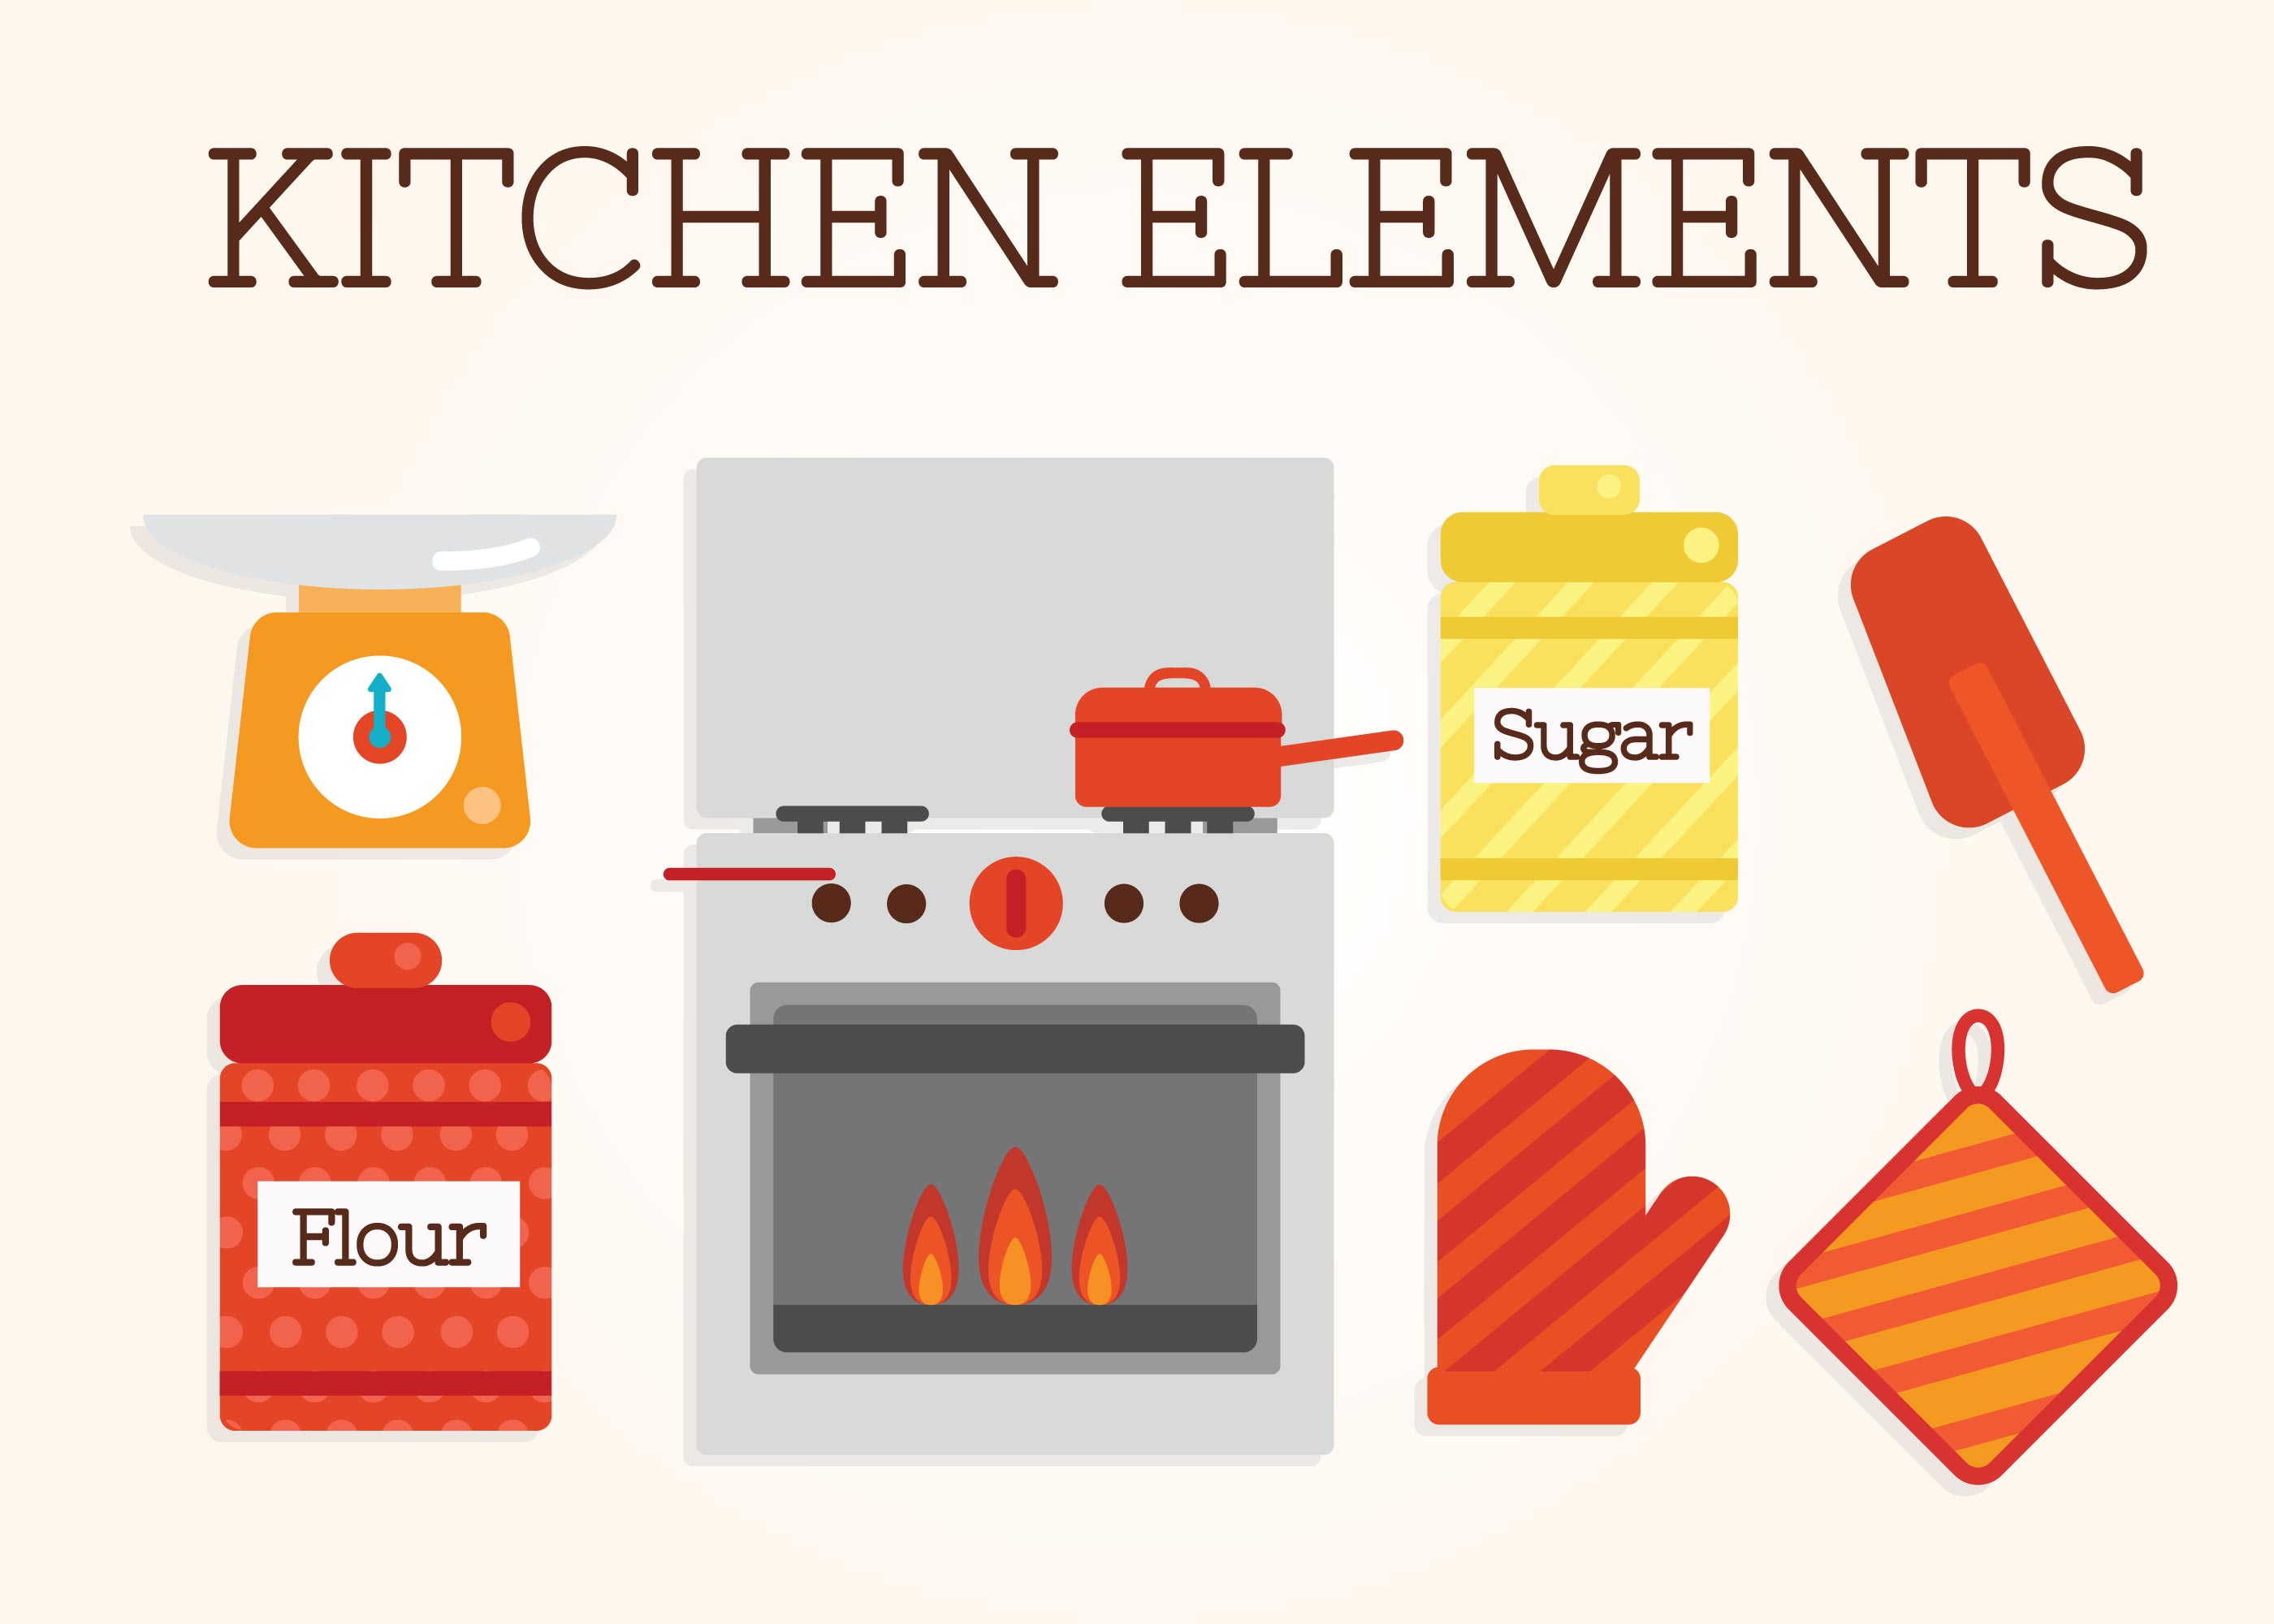 Vetor de elementos de cozinha download vetores e for Elementos de cocina para chef